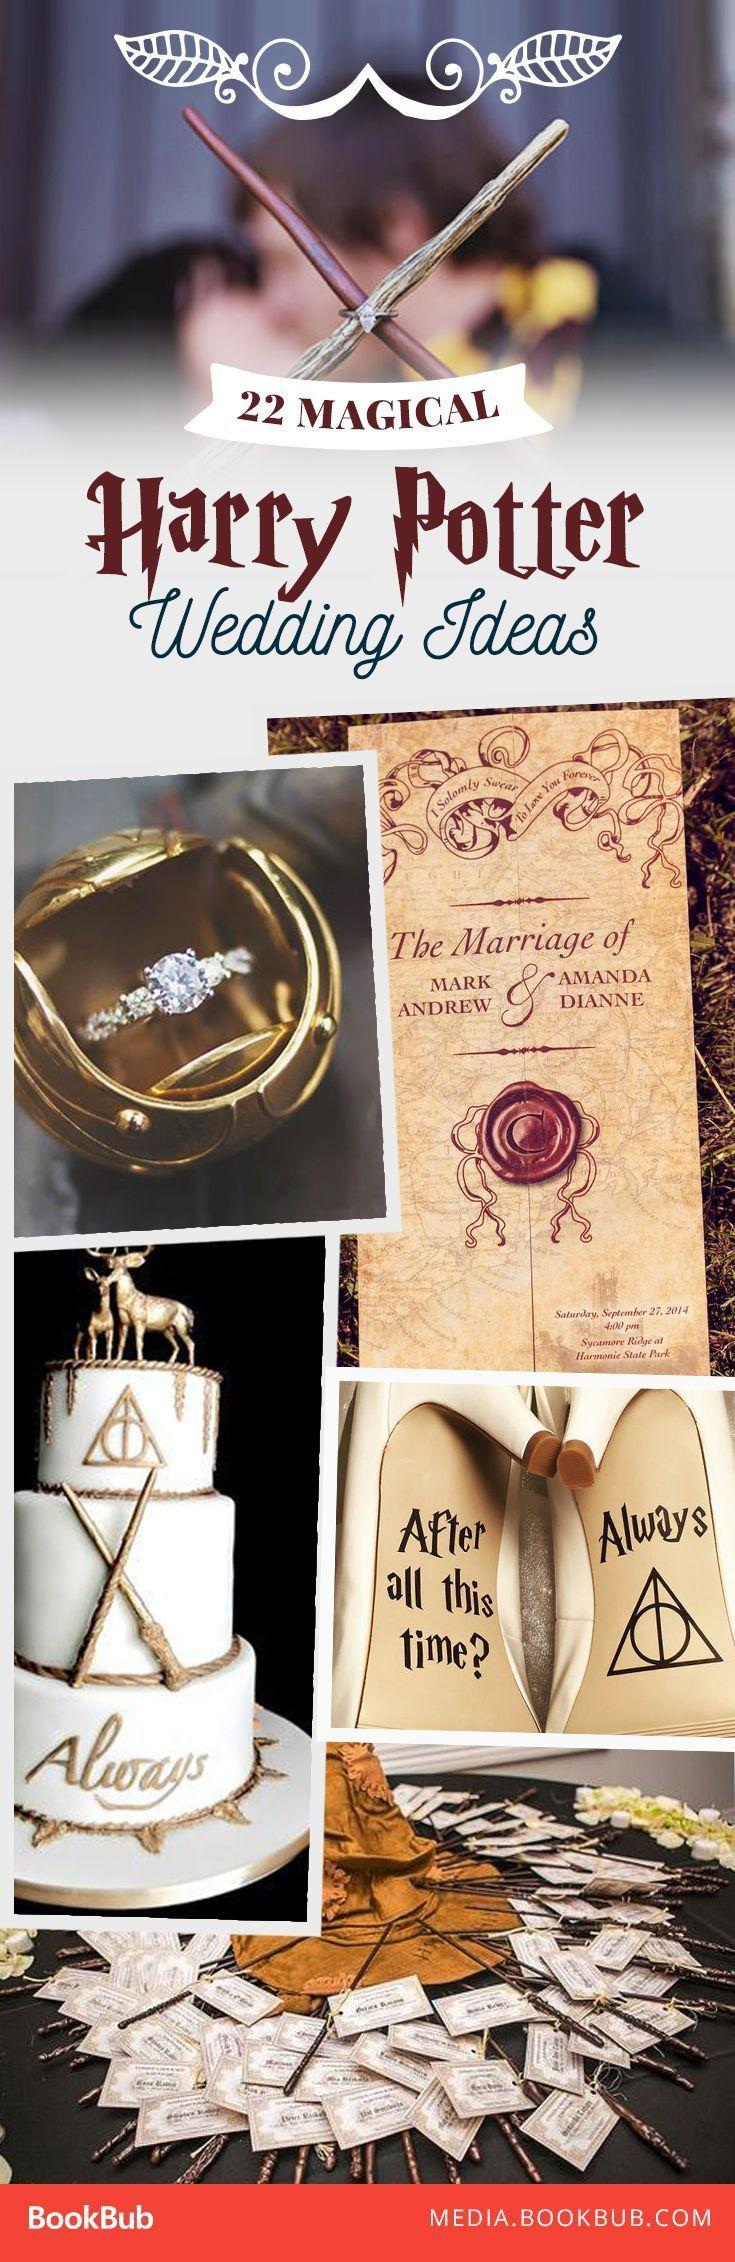 20 Magisch & # 39; Harry Potter & # 39; Hochzeitsideen – # 39Harry #Magic # Potter39 … – Harvey Clark – Ver Mo